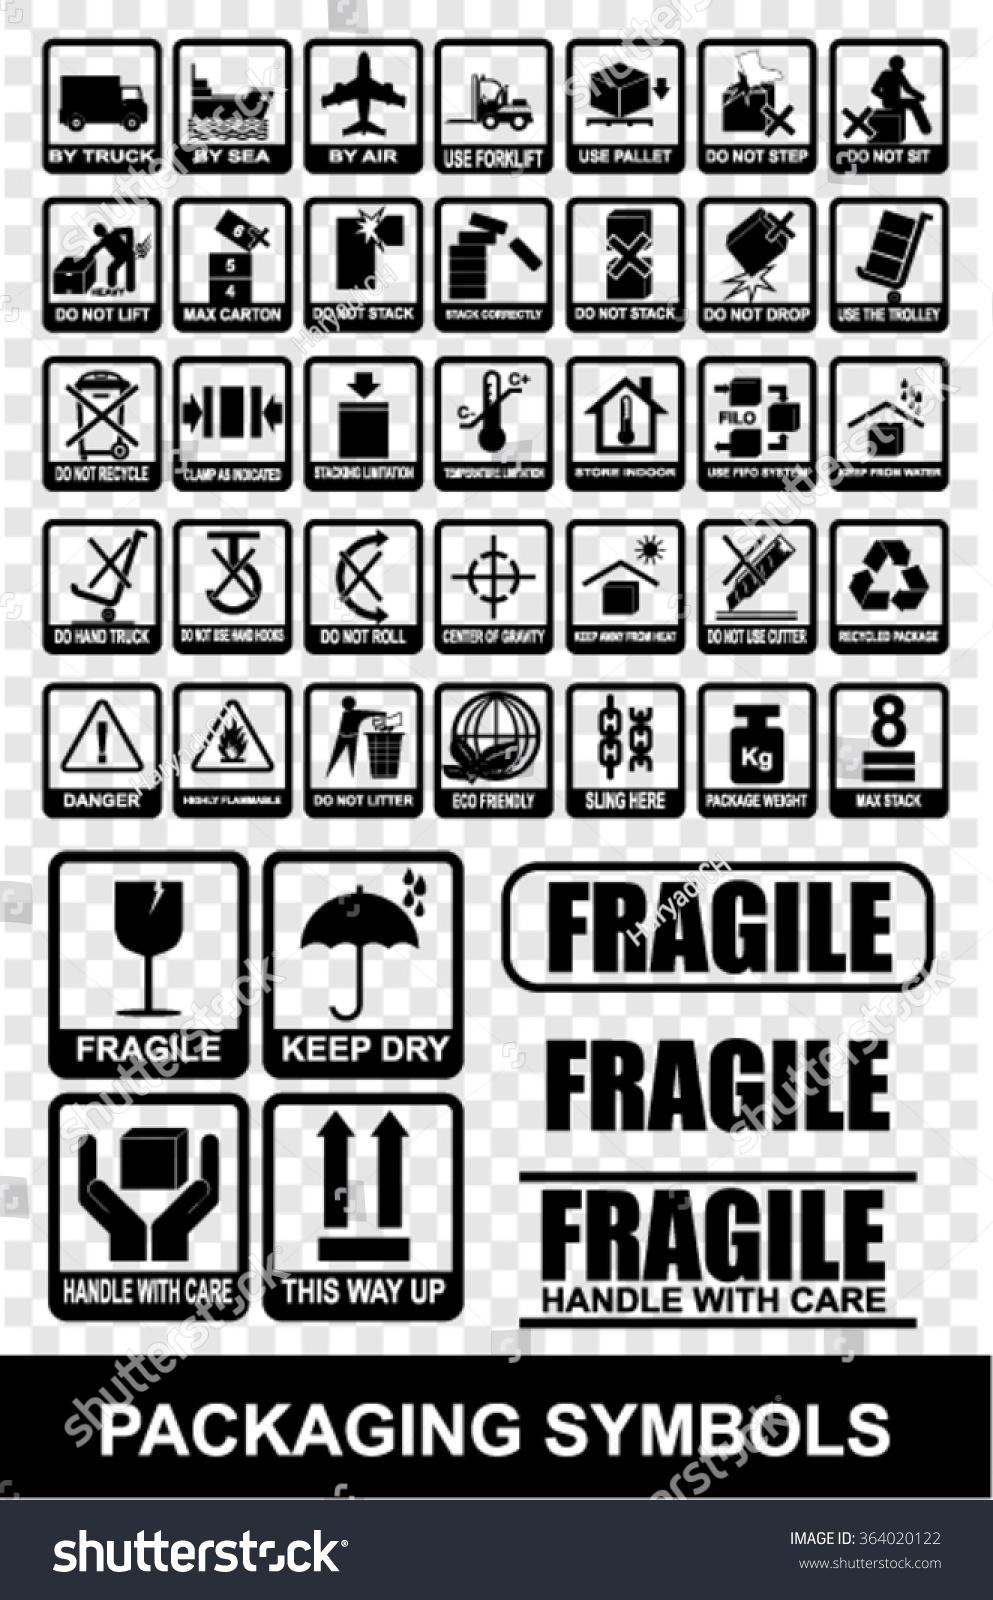 What is the dishwasher safe symbol images symbol and sign ideas symbols icon packaging stock vector 364020122 shutterstock symbols icon packaging buycottarizona buycottarizona